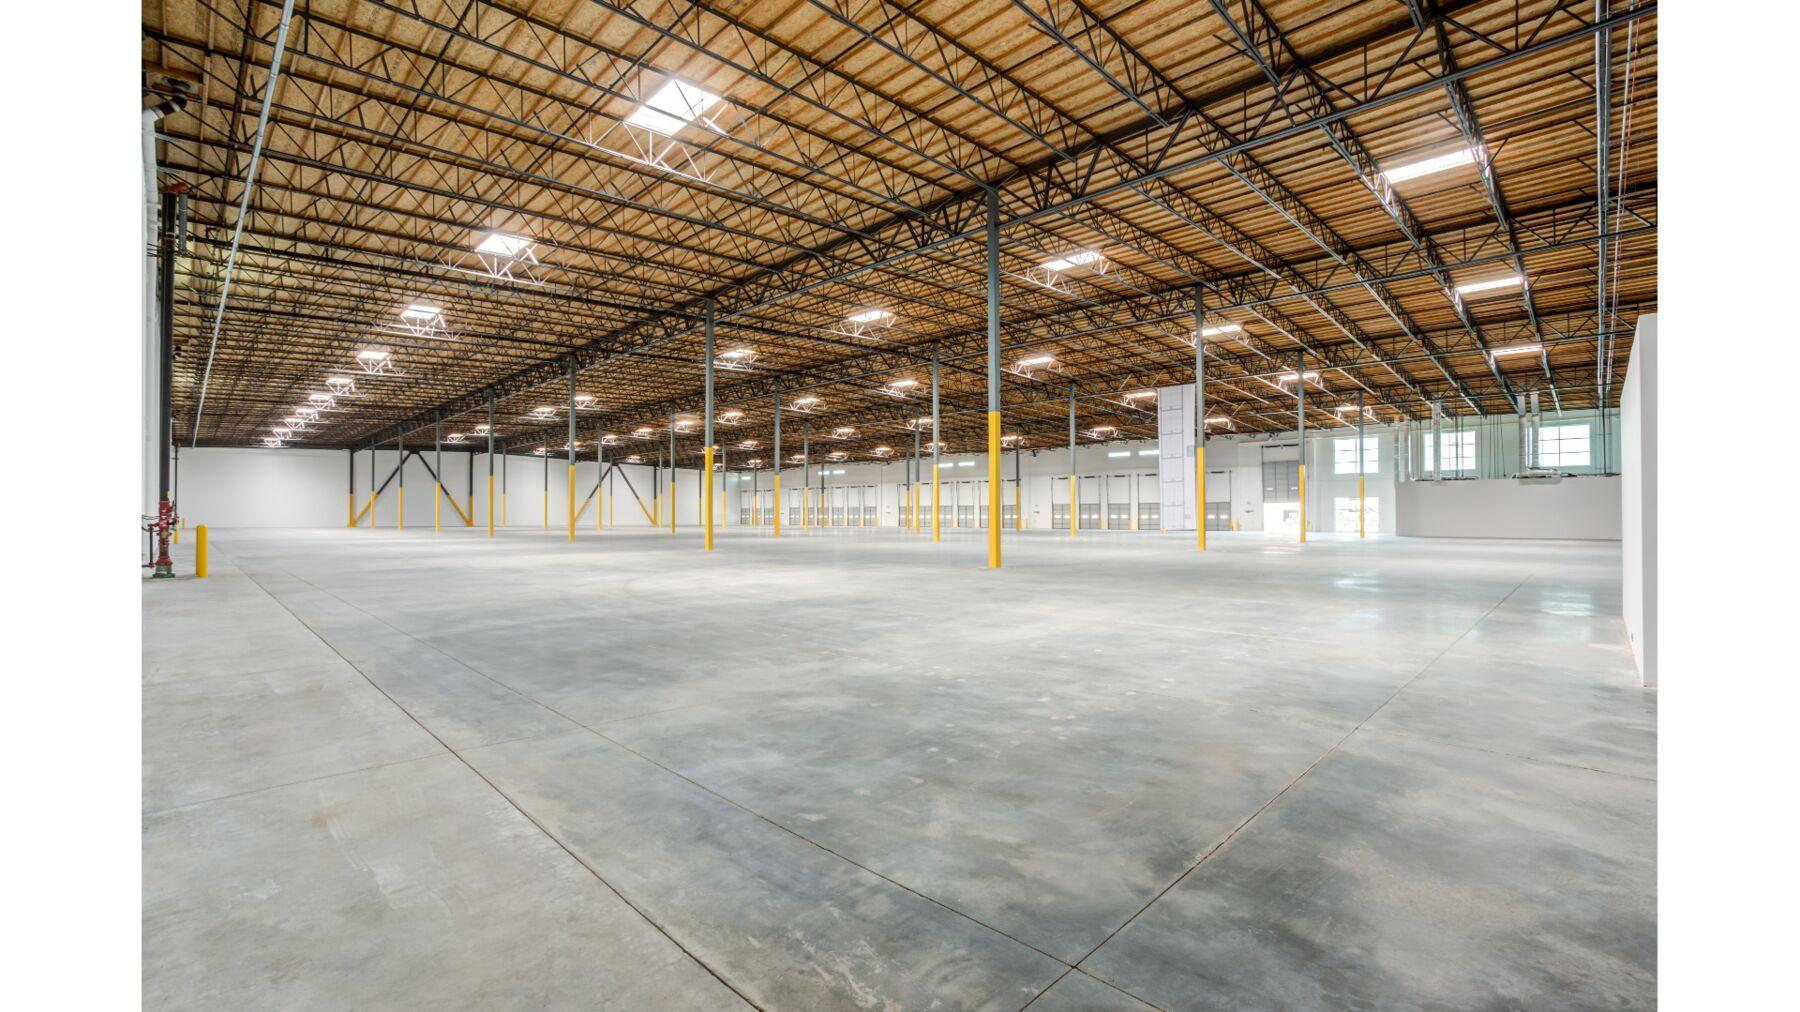 DPM-Prologis-Oakland-Global-Logistics-Ctr-2-5.jpg